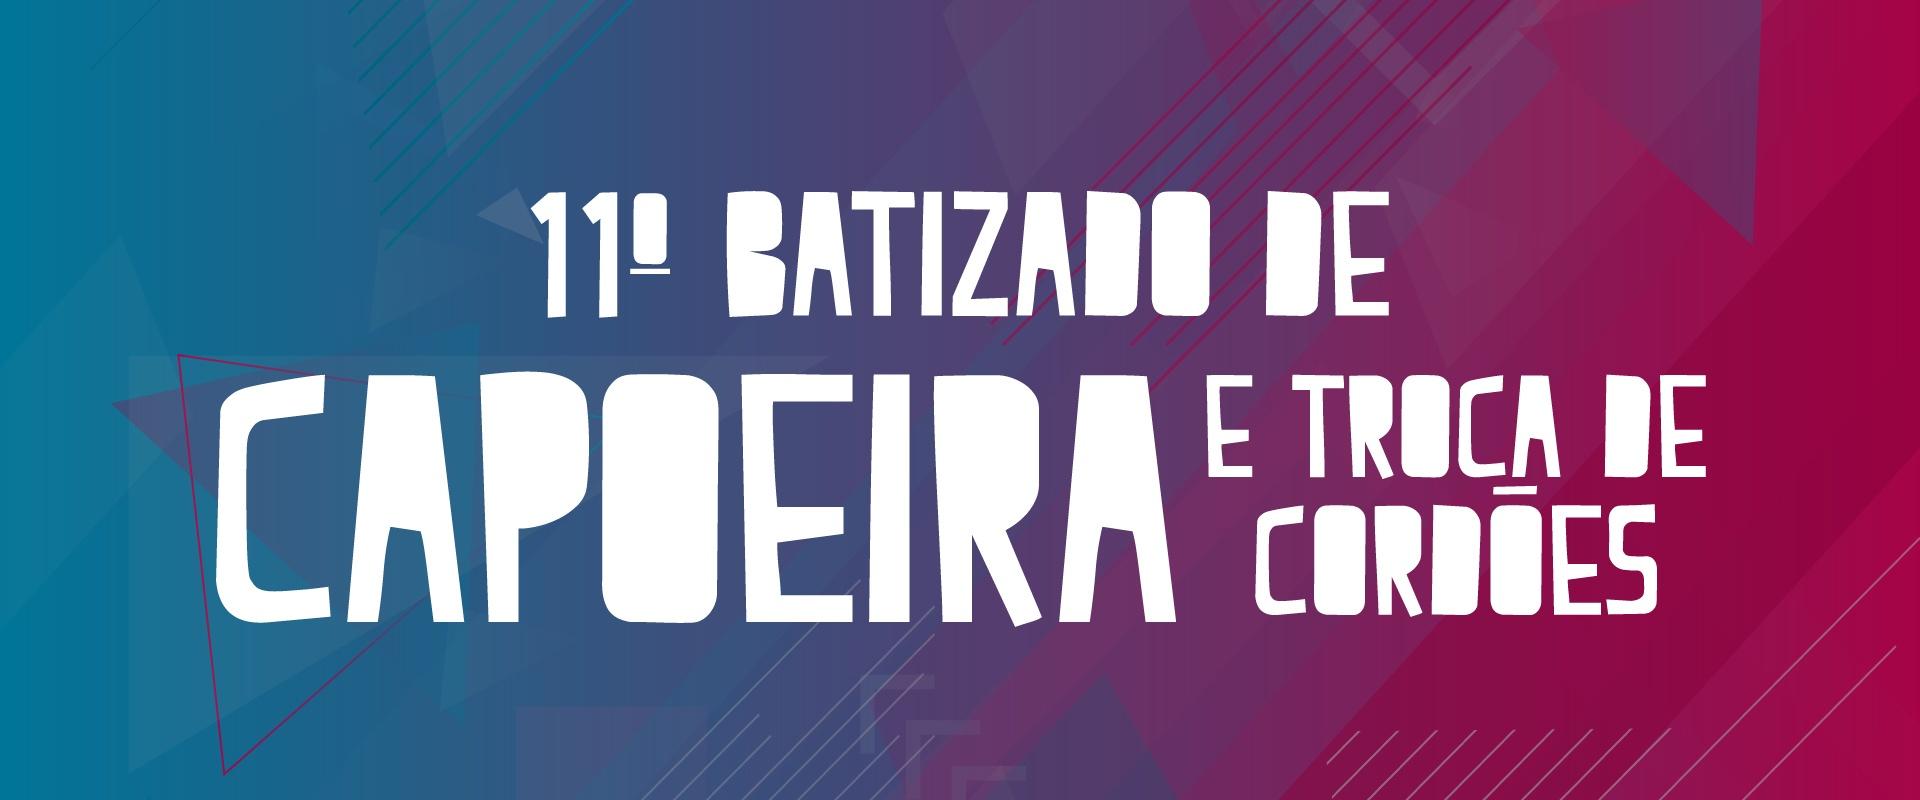 site_batizado capoeira_Site_banner